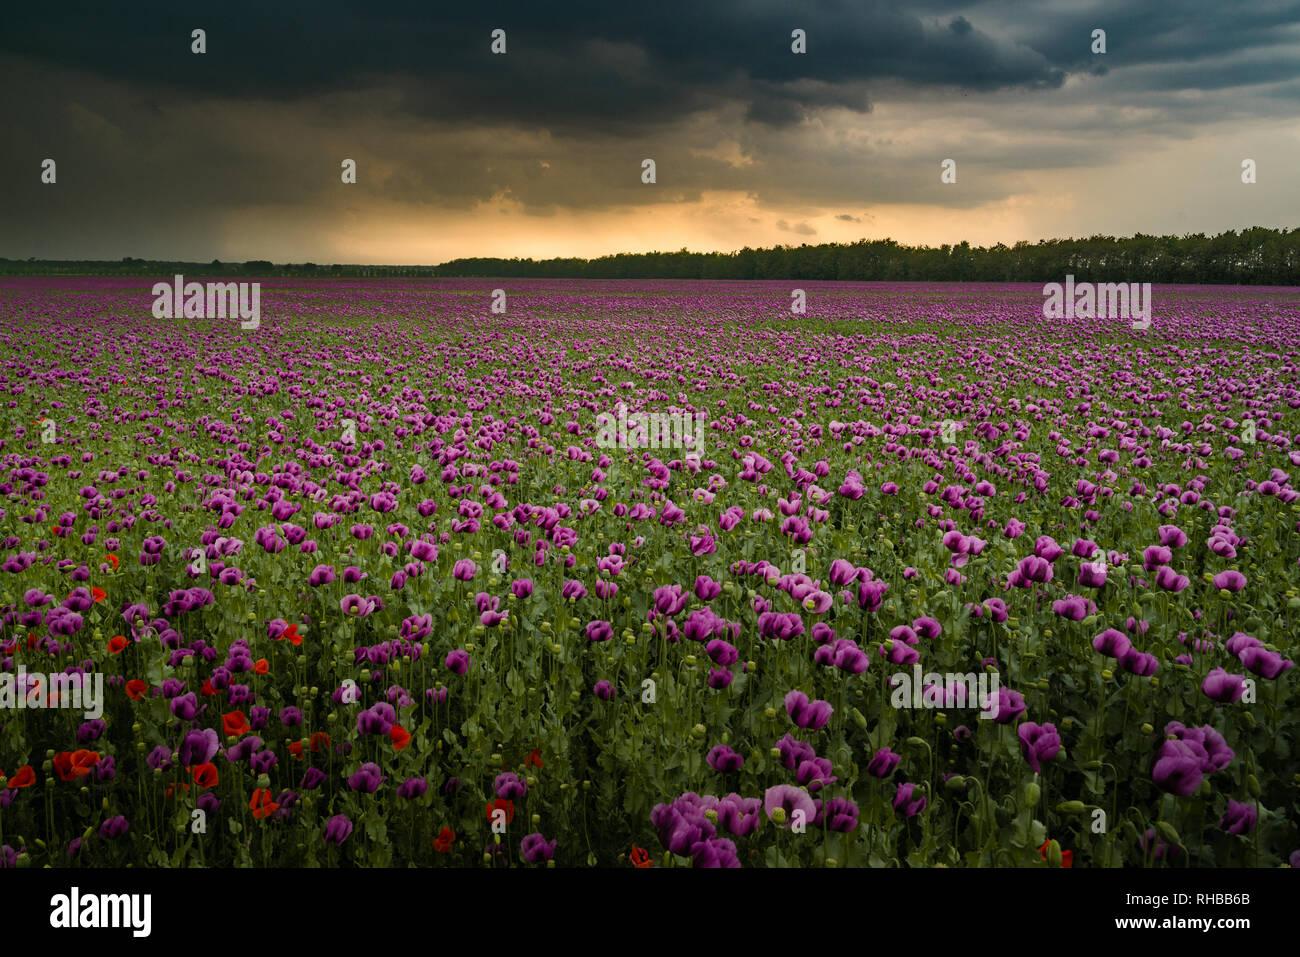 Opium poppy field with overcast dramatic sky Stock Photo